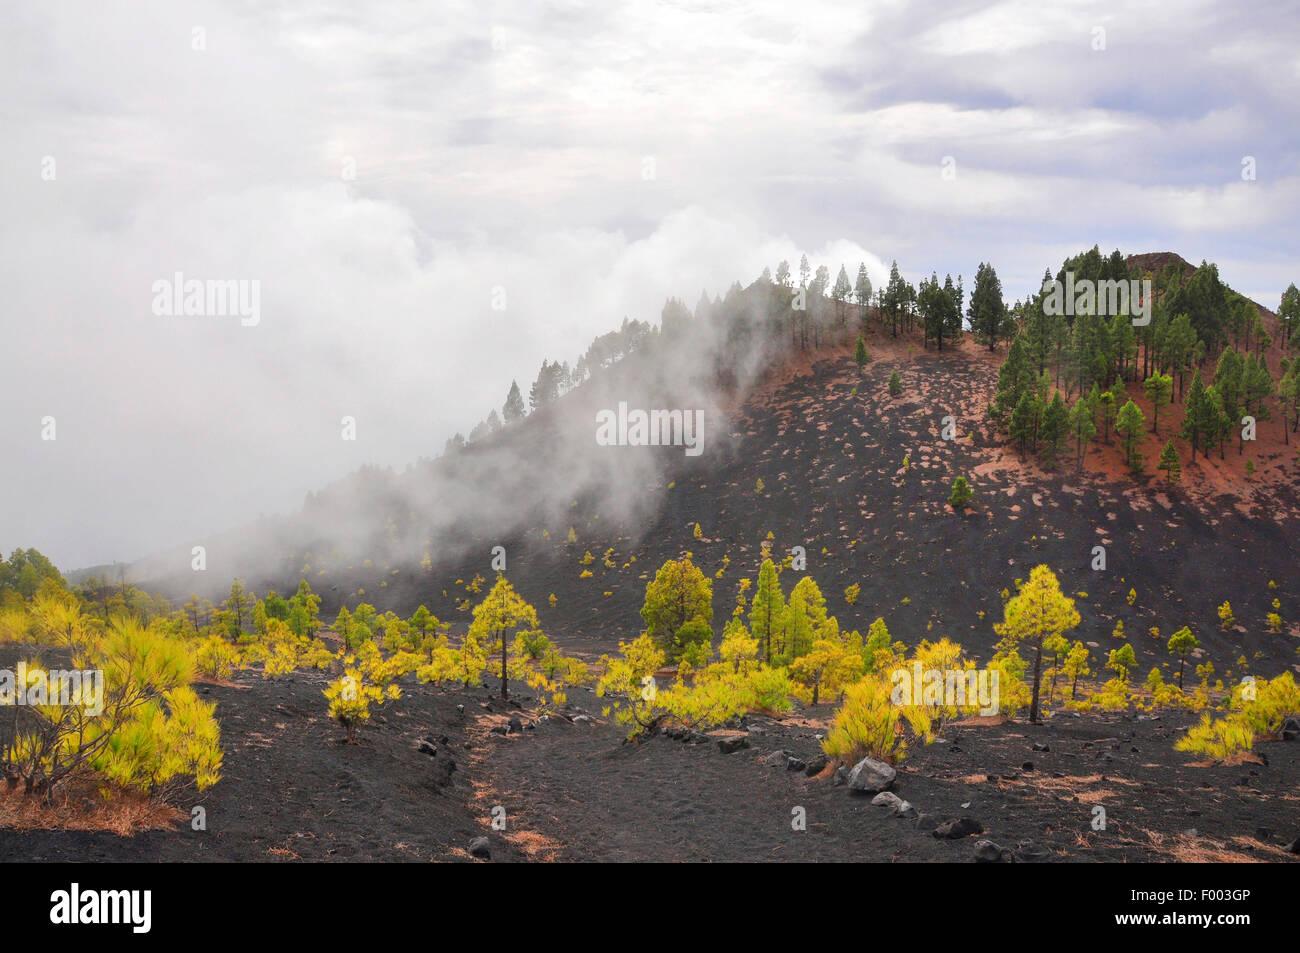 Canary pine (Pinus canariensis), on lava ash in the fog, Canary Islands, La Palma, Llanos de Jable - Stock Image